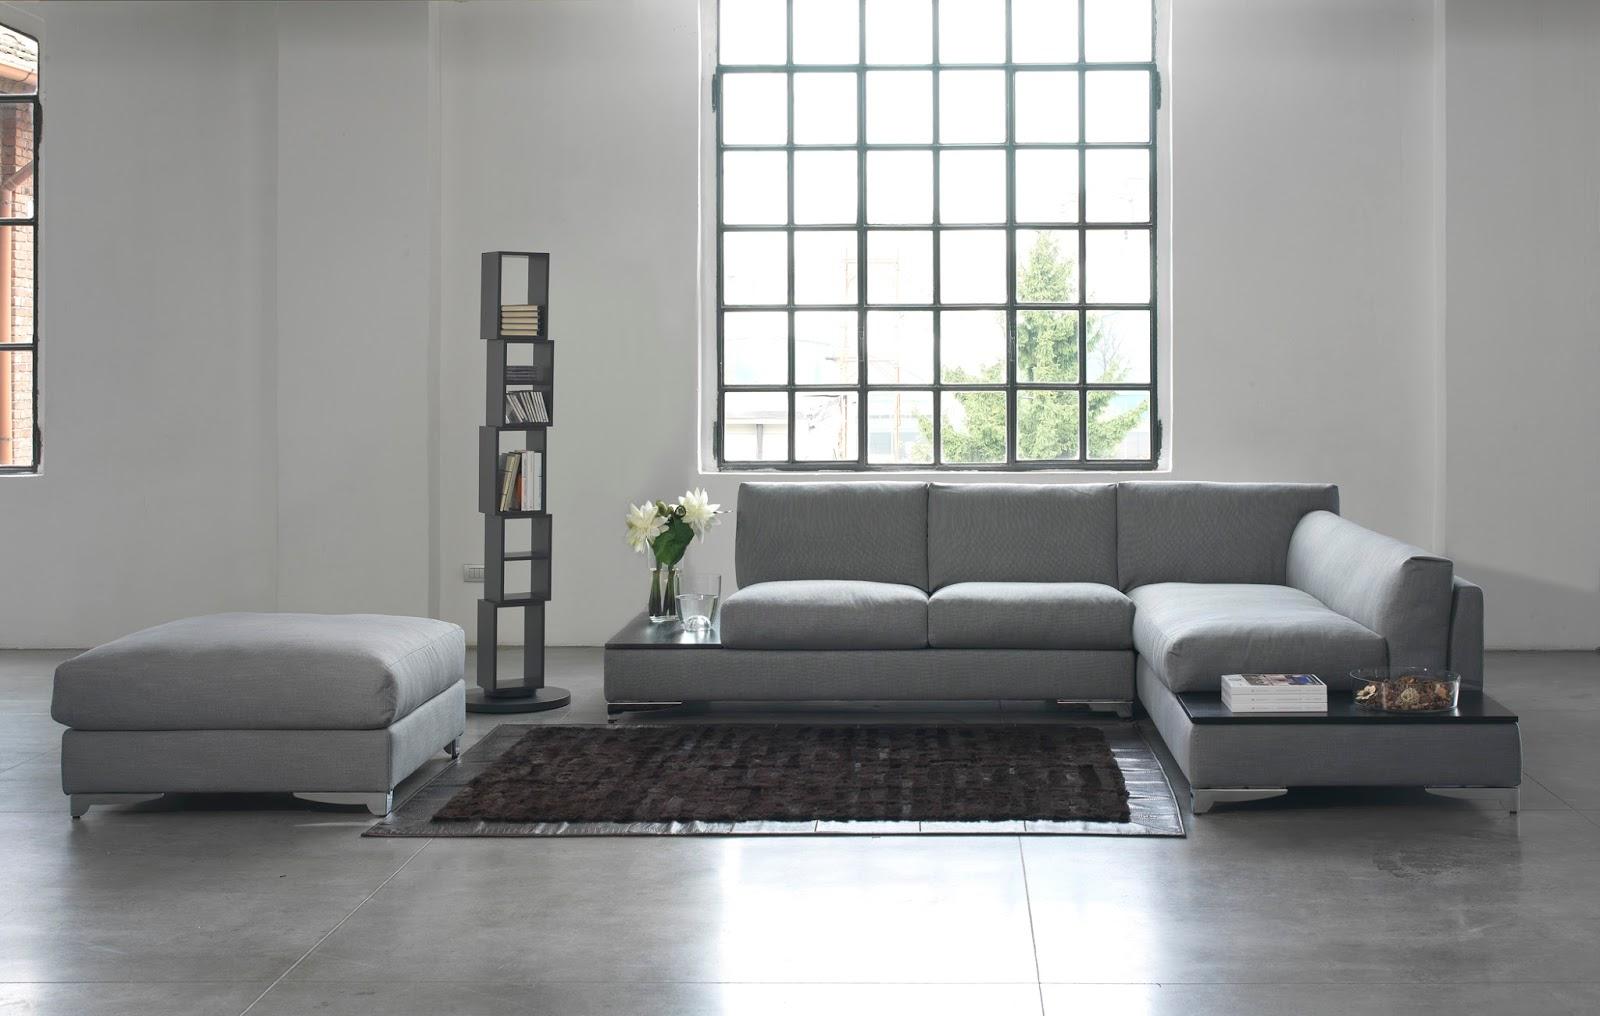 Divani blog tino mariani fotogallery 7 divani moderni - Cuscini moderni divano ...